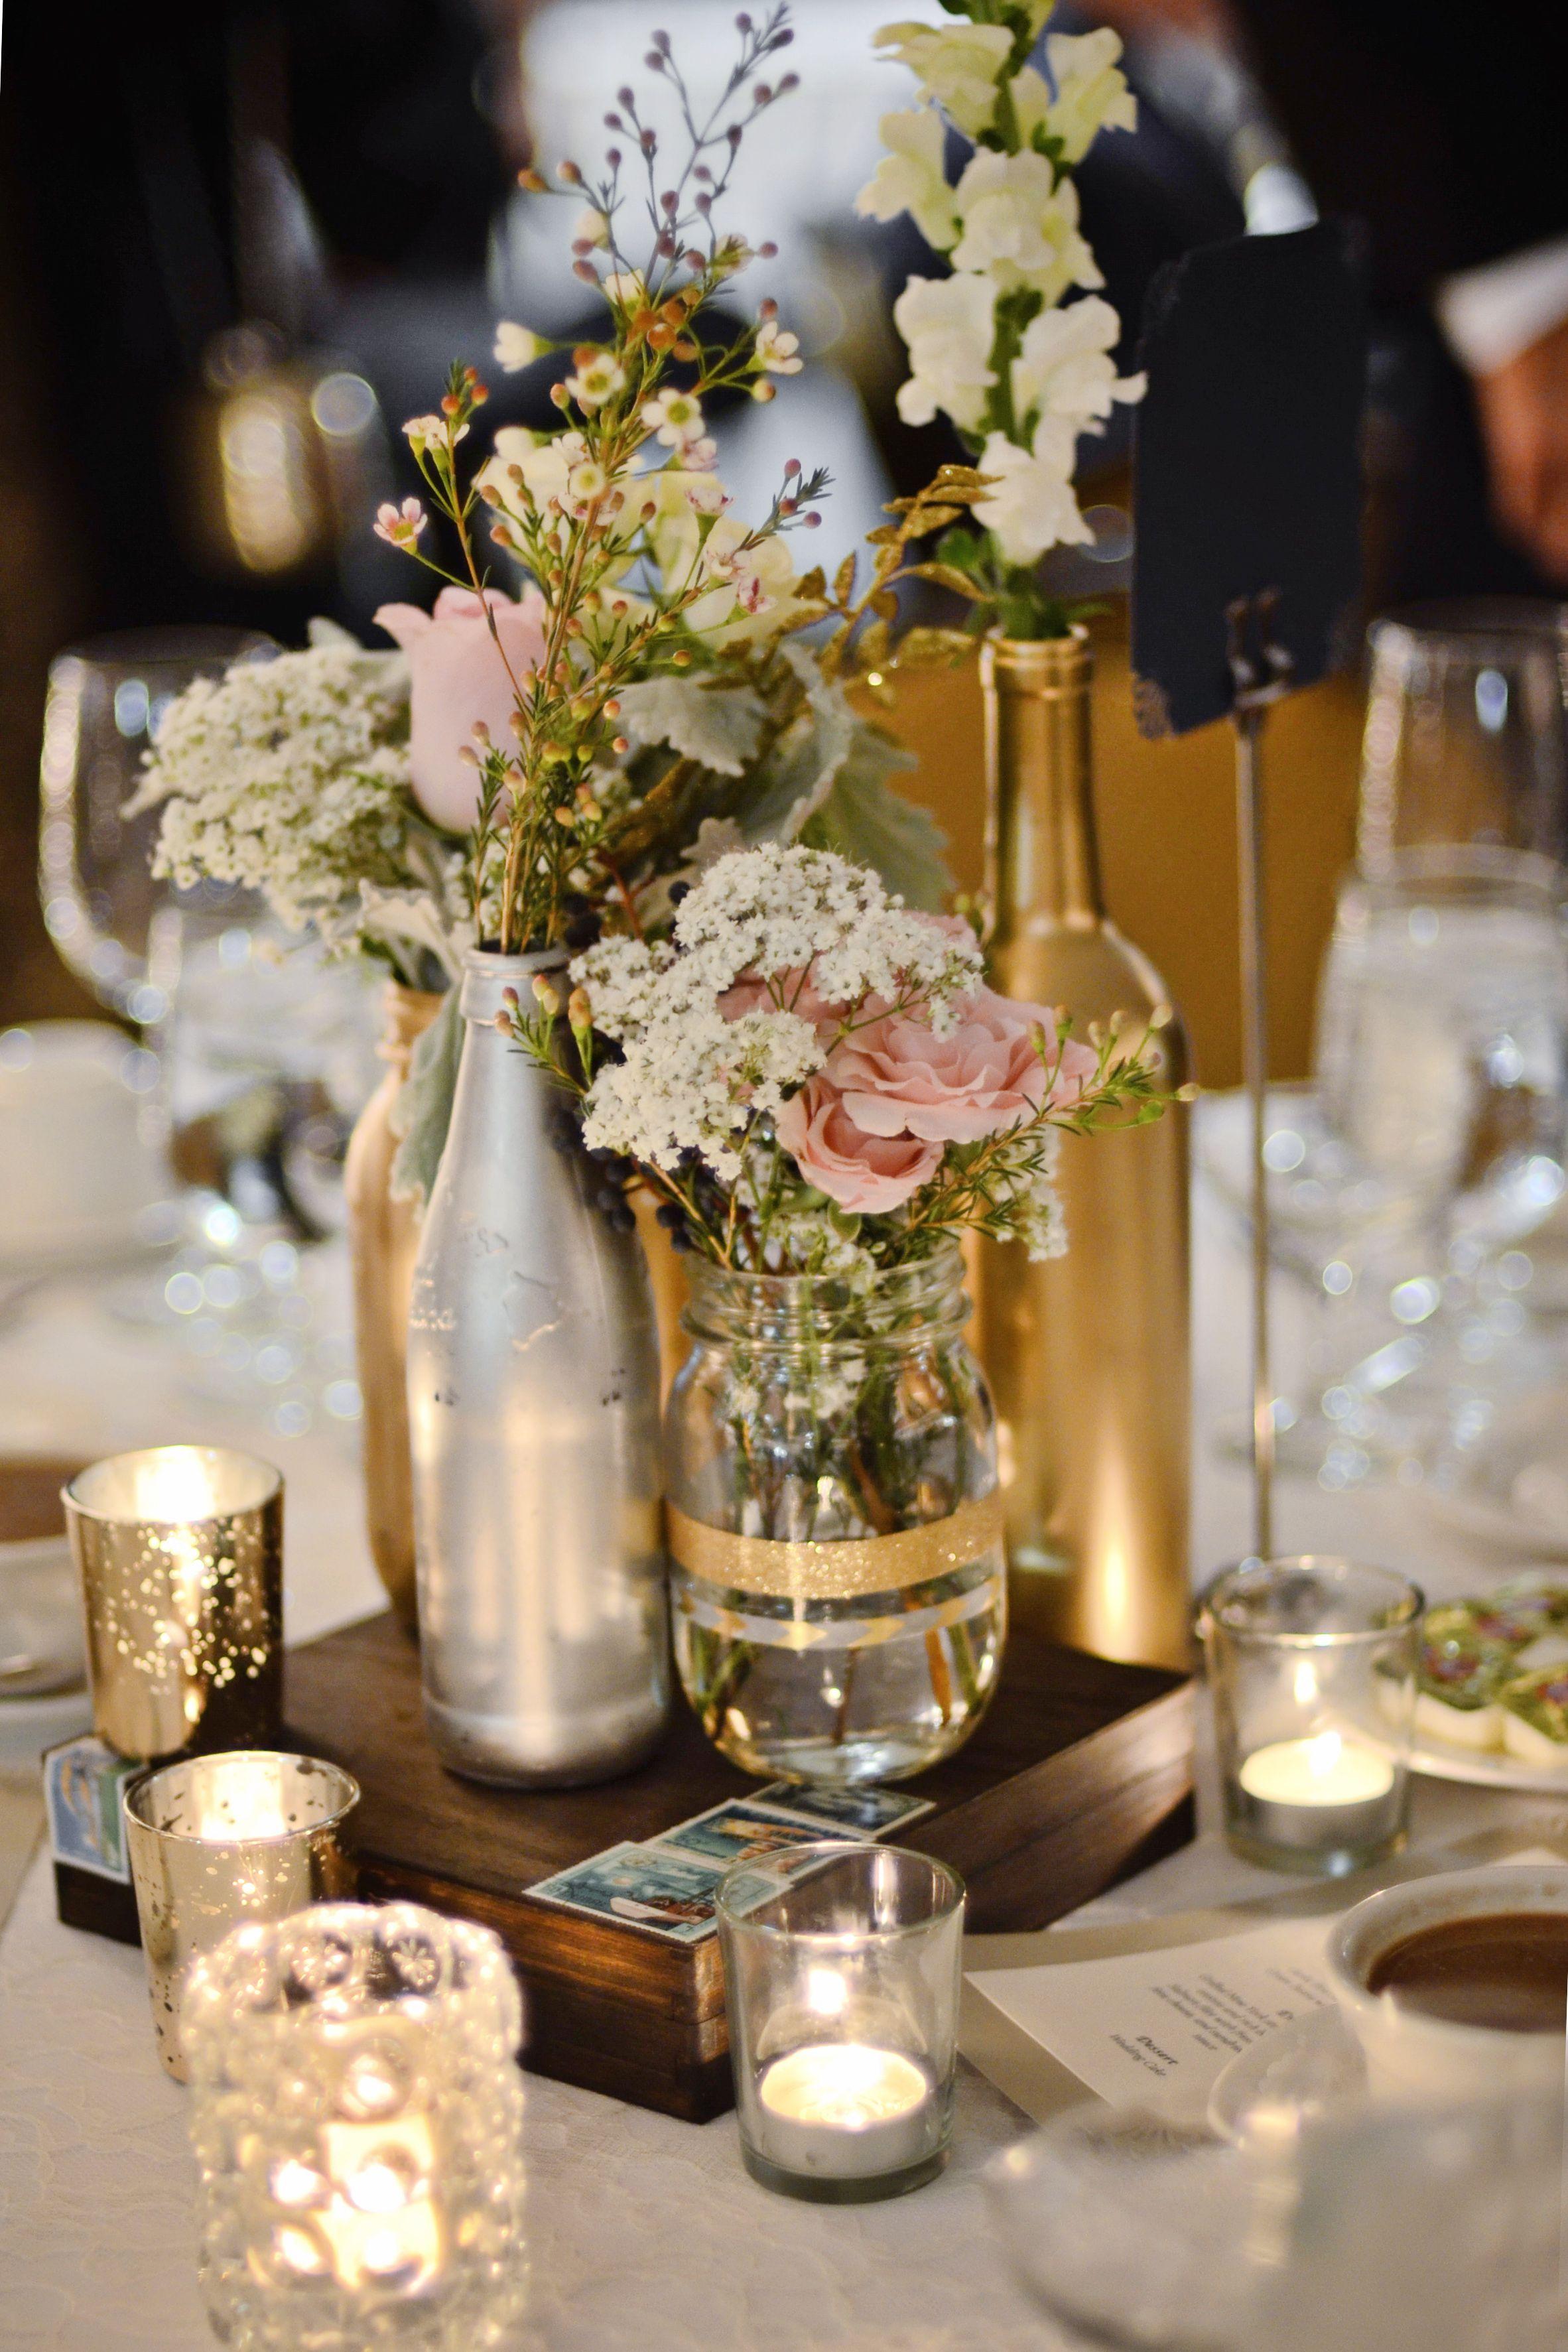 Wedding decorations with wine bottles  Tim u Sheena Vintage Aviation Inspired Theme  Wedding  Pinterest